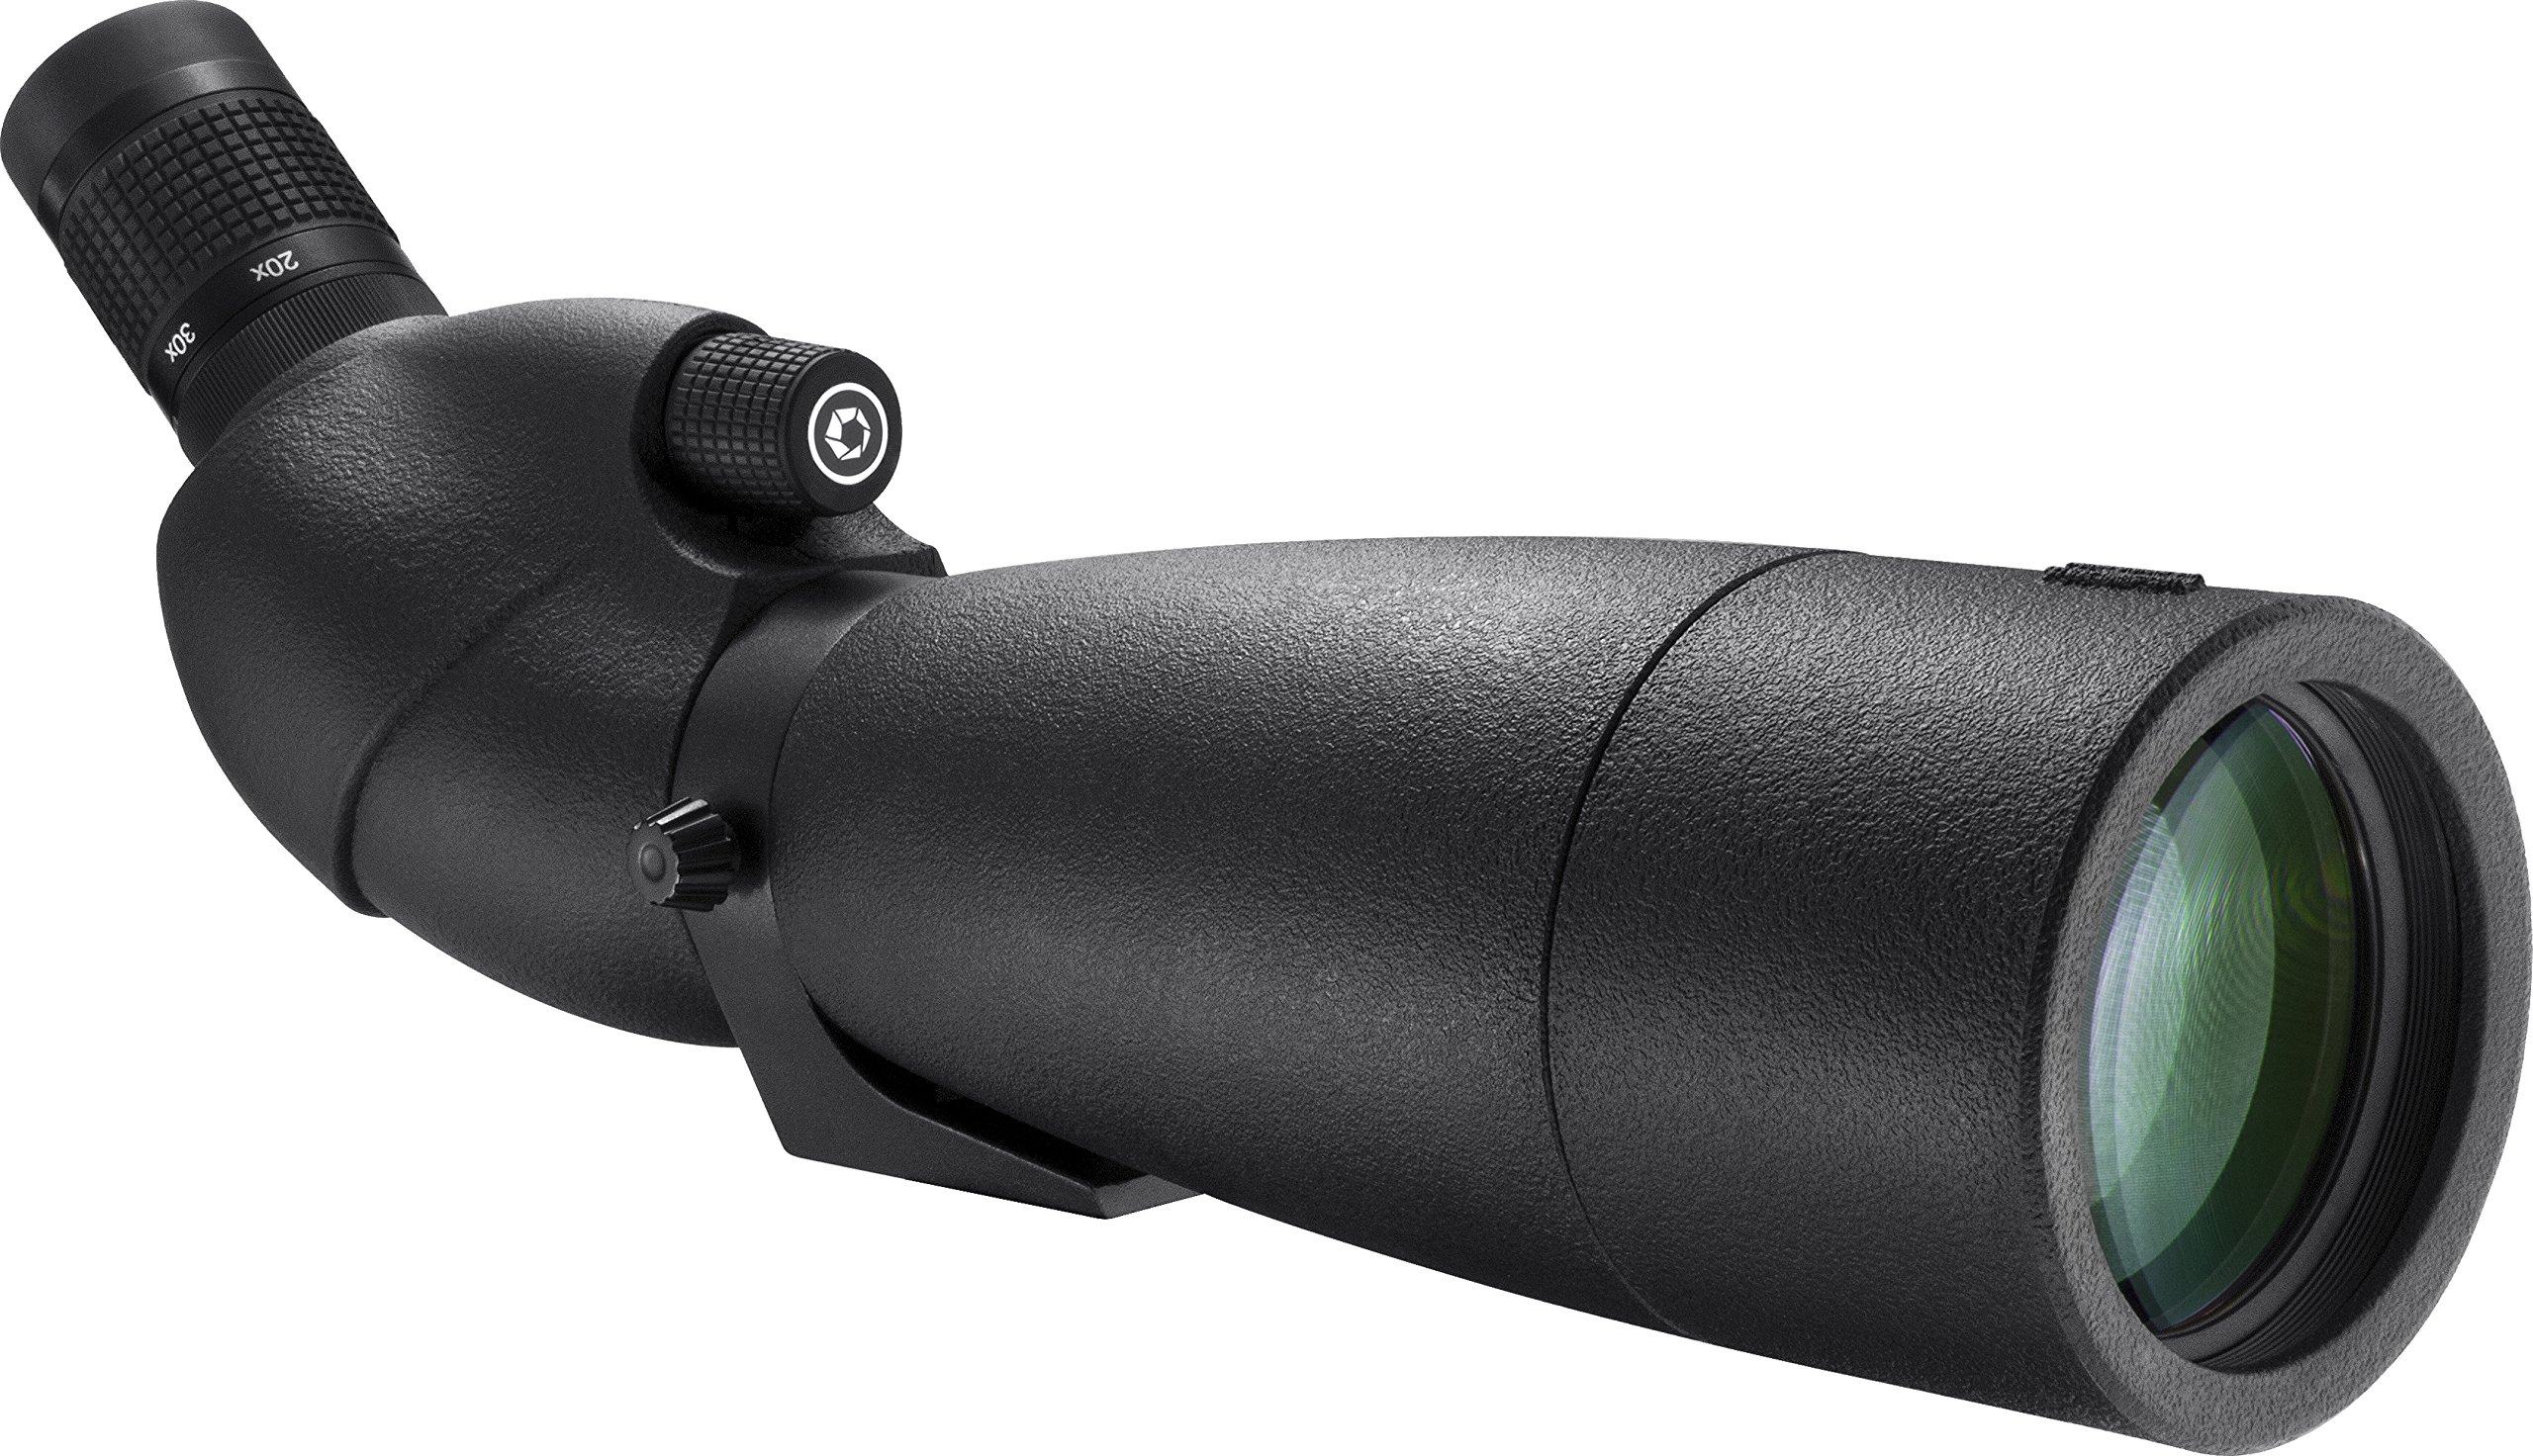 BARSKA AD12360 WP Level Angled Spotting Scope, Black, 20-60x80 by BARSKA